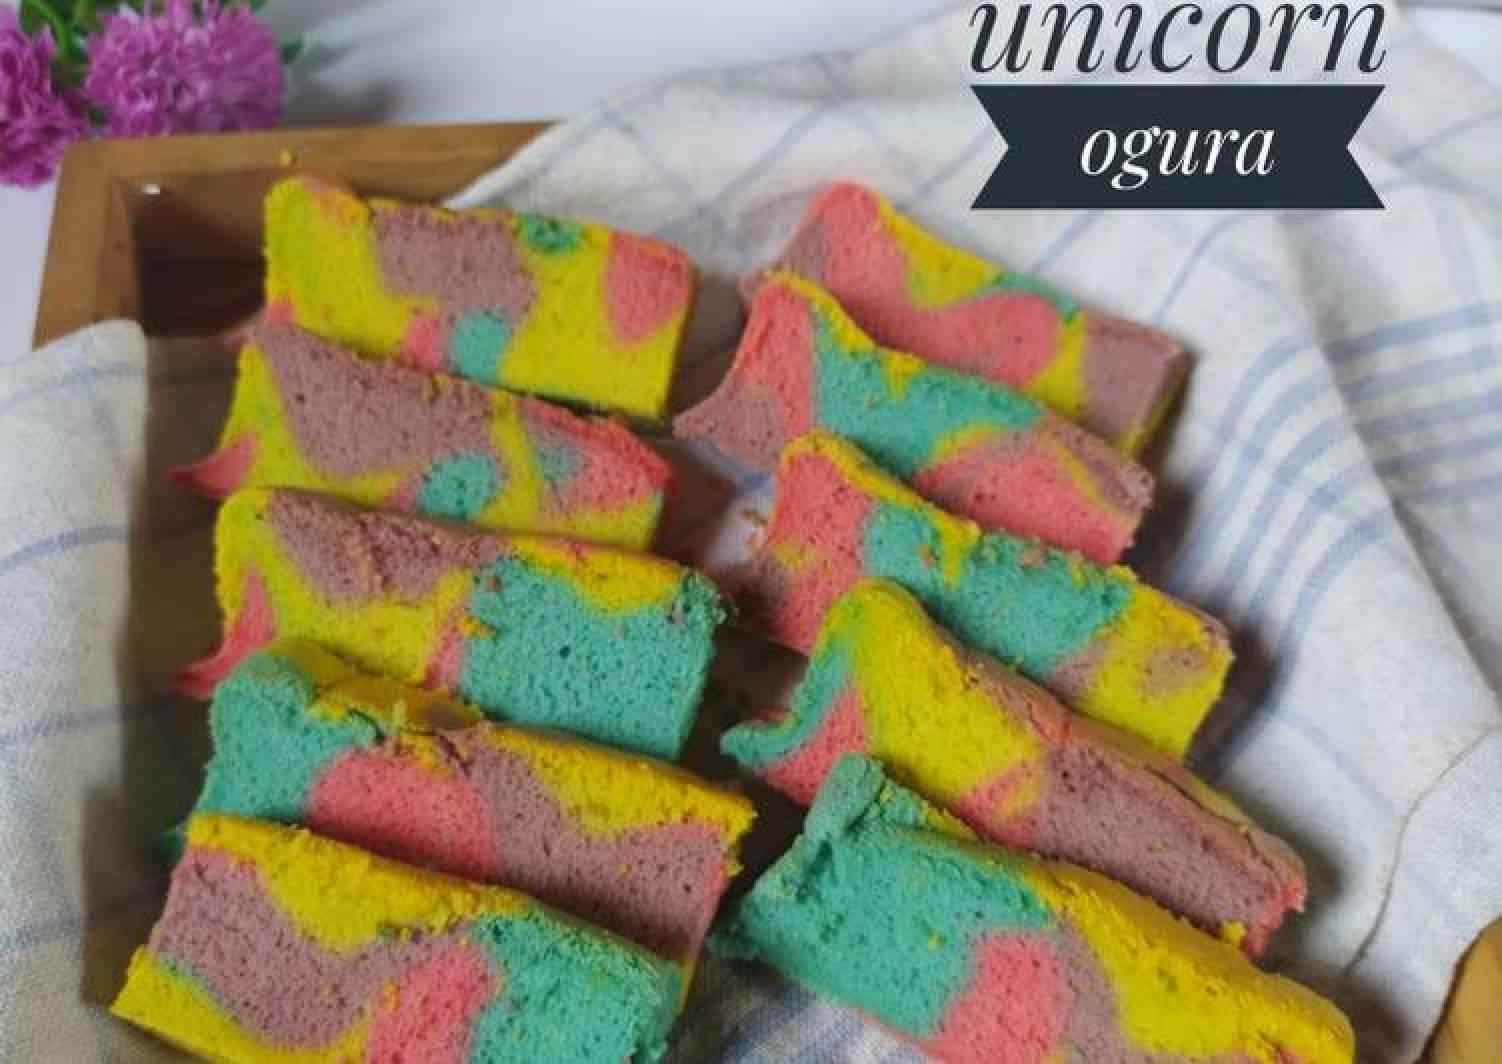 Resep Unicorn Ogura Cake Enak Resep Terbaik